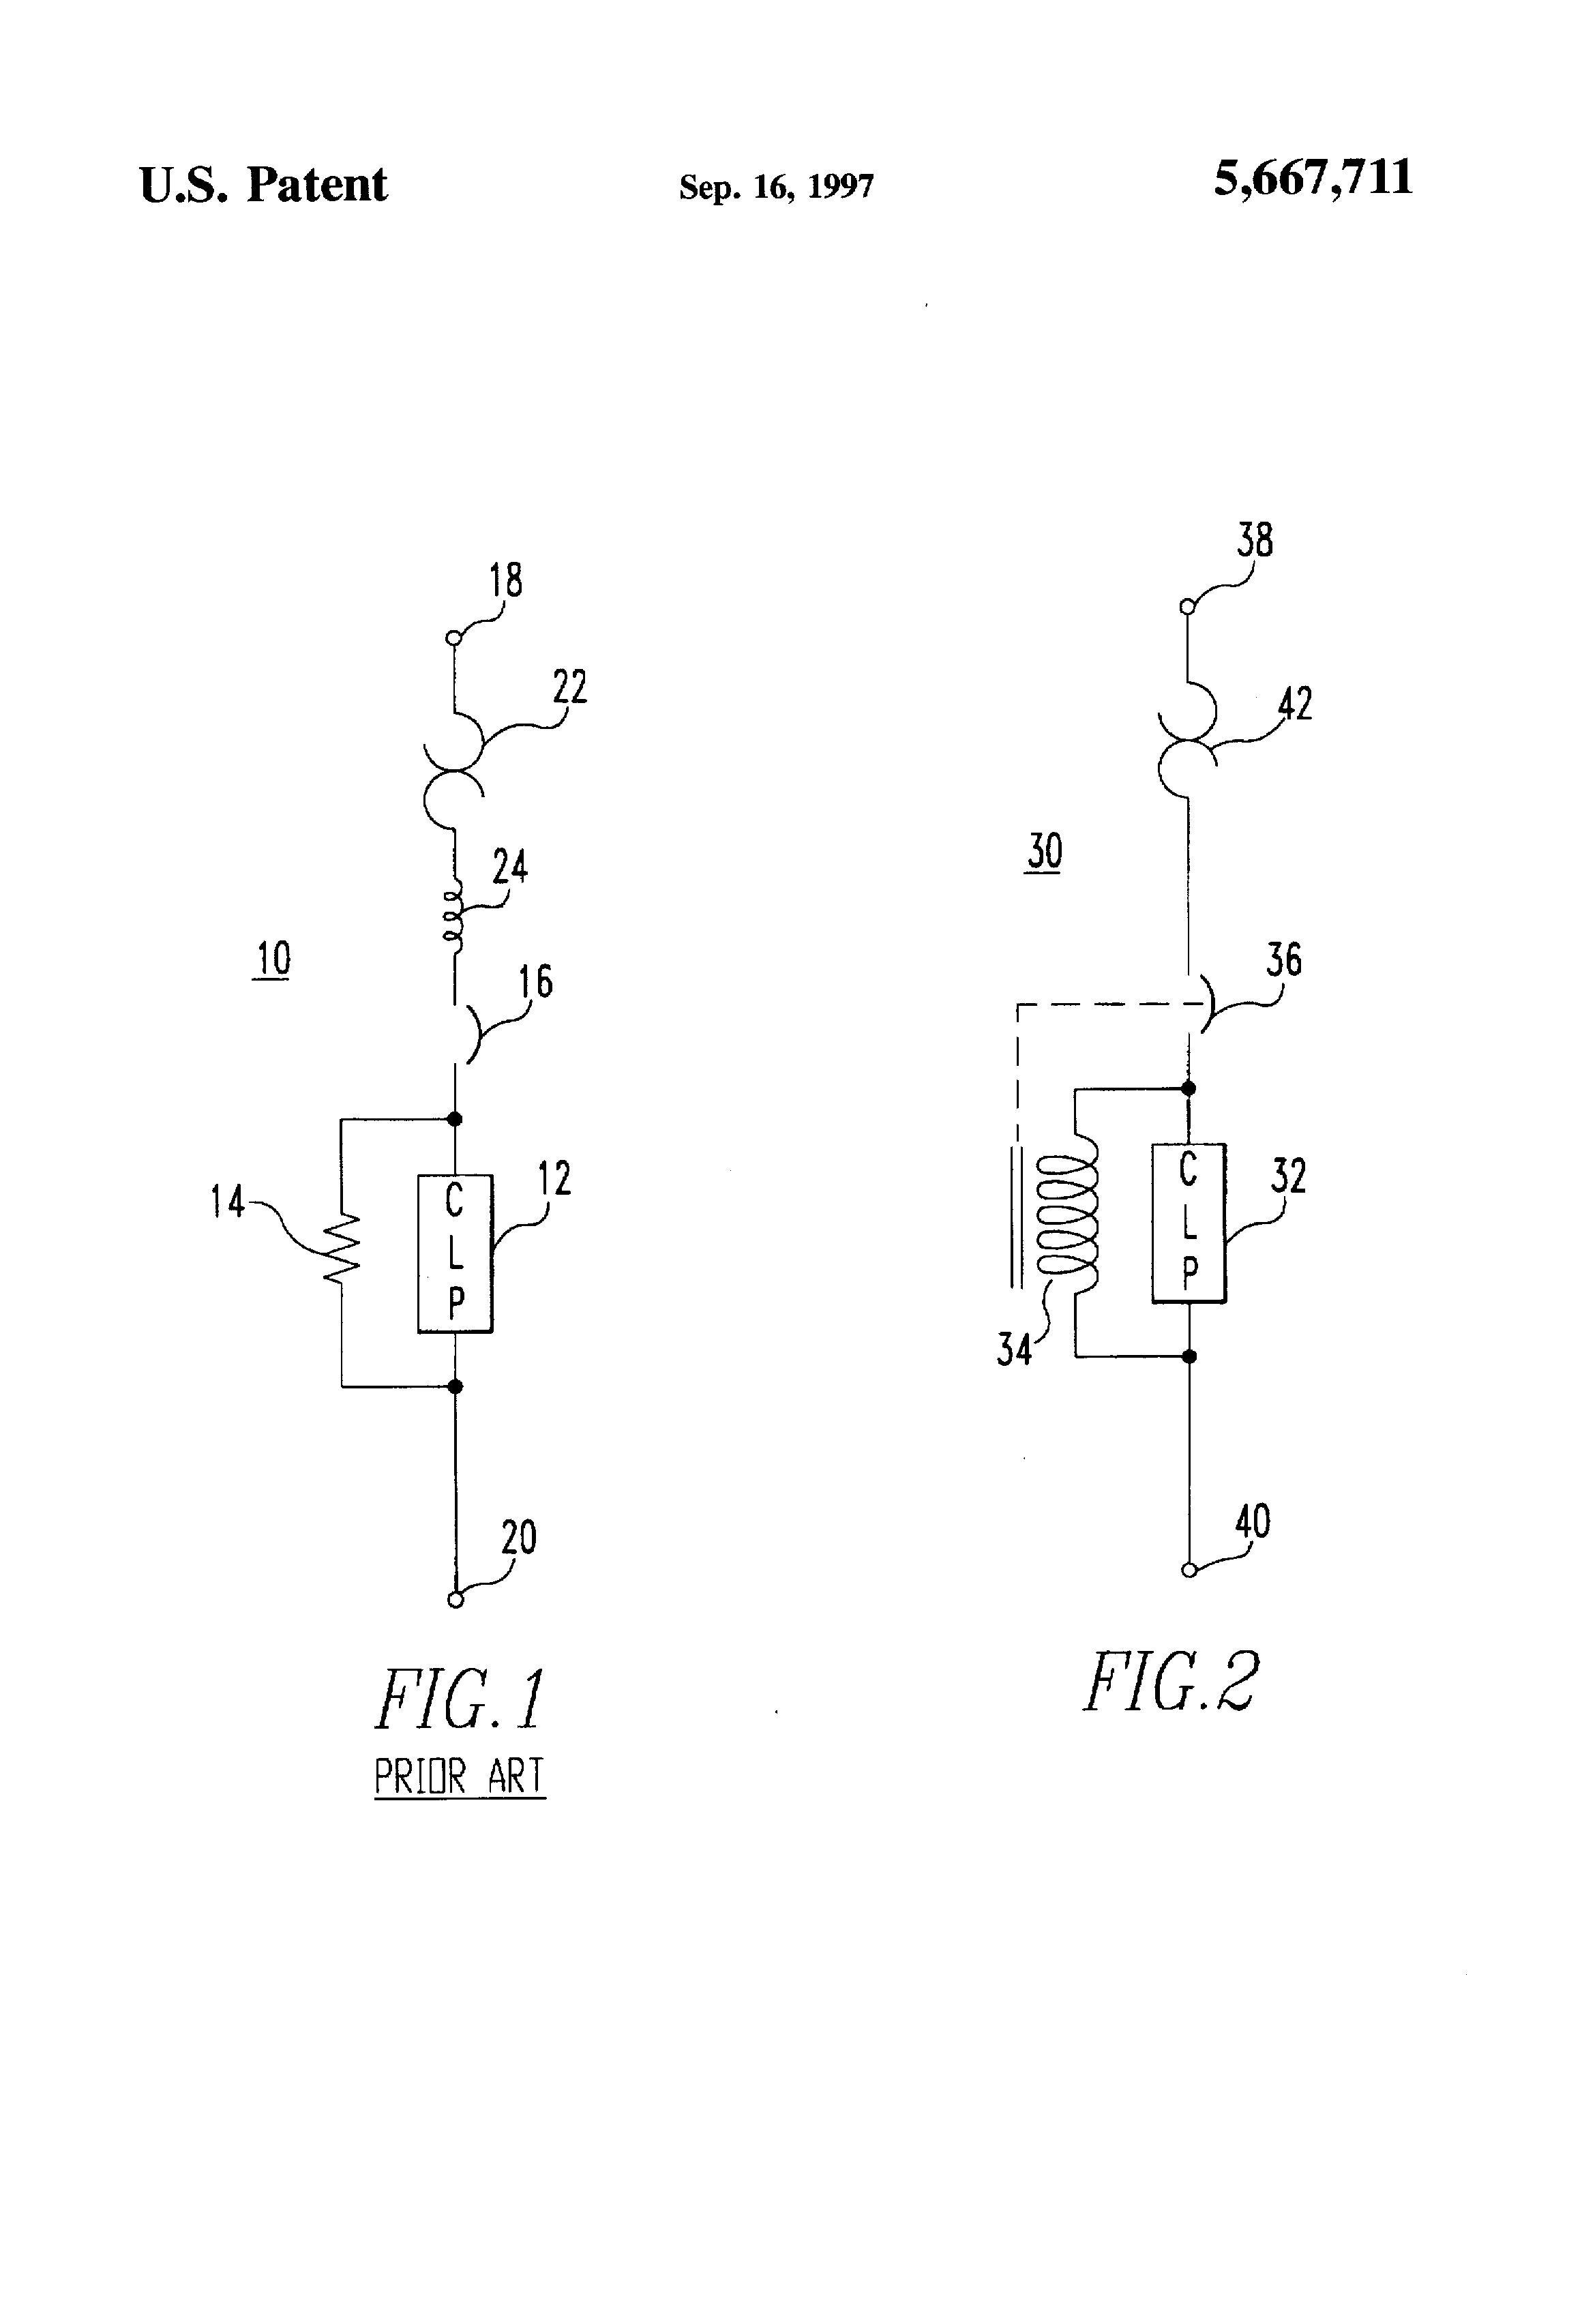 Eaton Shunt Trip Breaker Wiring Diagram : 39 Wiring